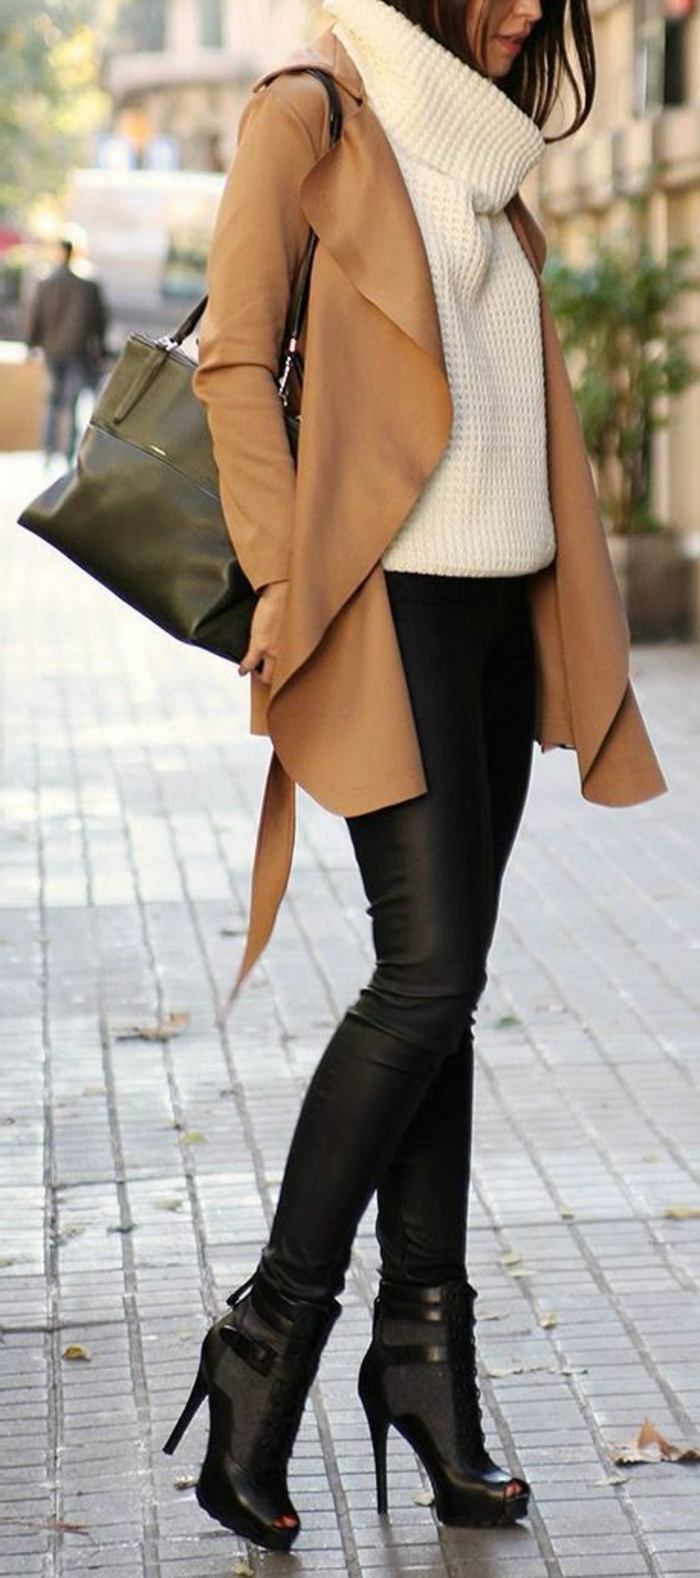 1-veste-en-daim-veste-marron-sac-a-dos-en-cuir-noir-pantalon-noir-mode-street